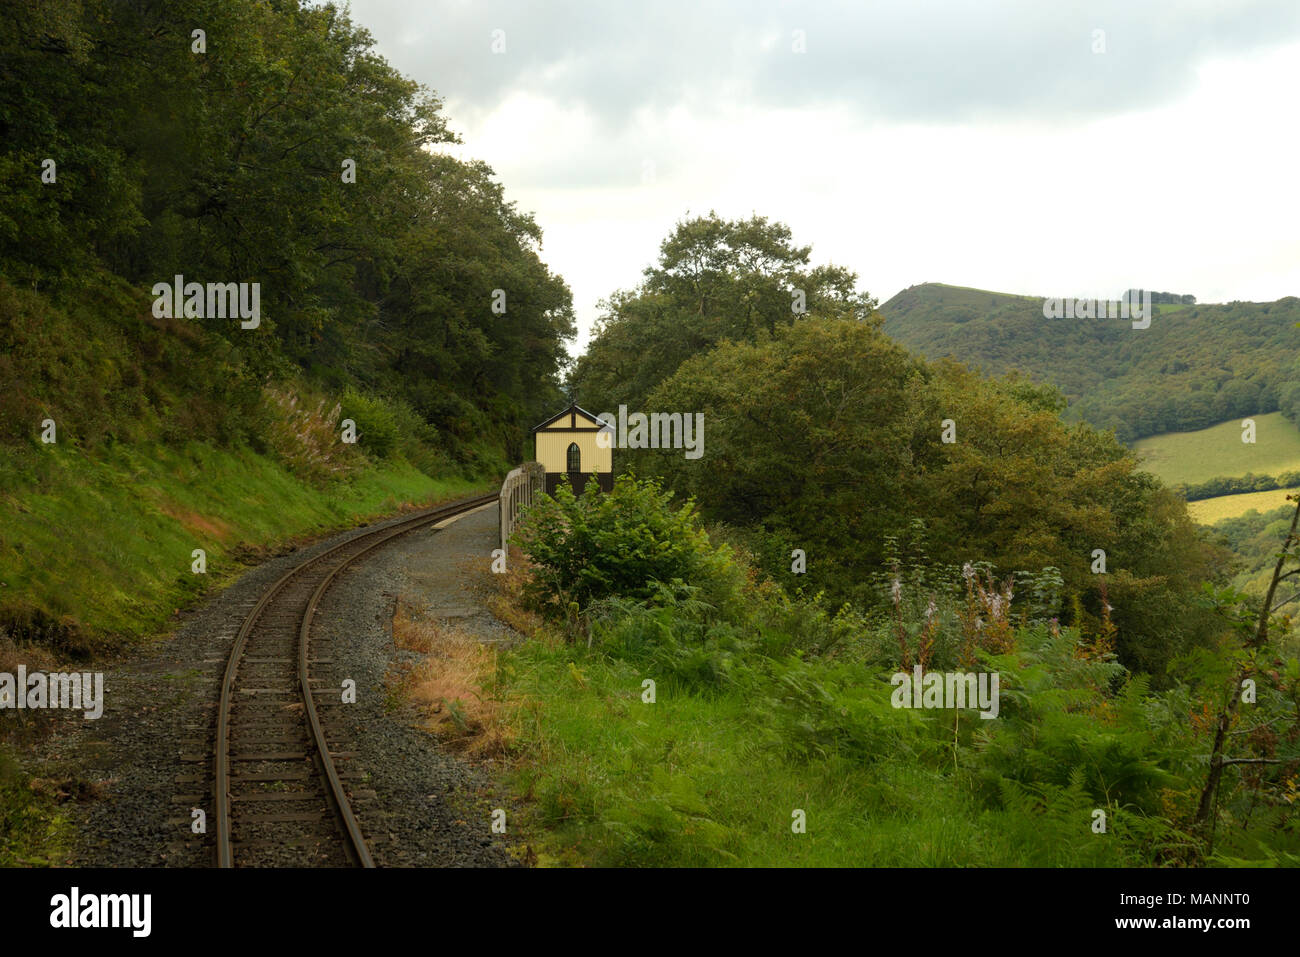 Rheidol Valley Railway, passing Rhiwfron Halt - Stock Image